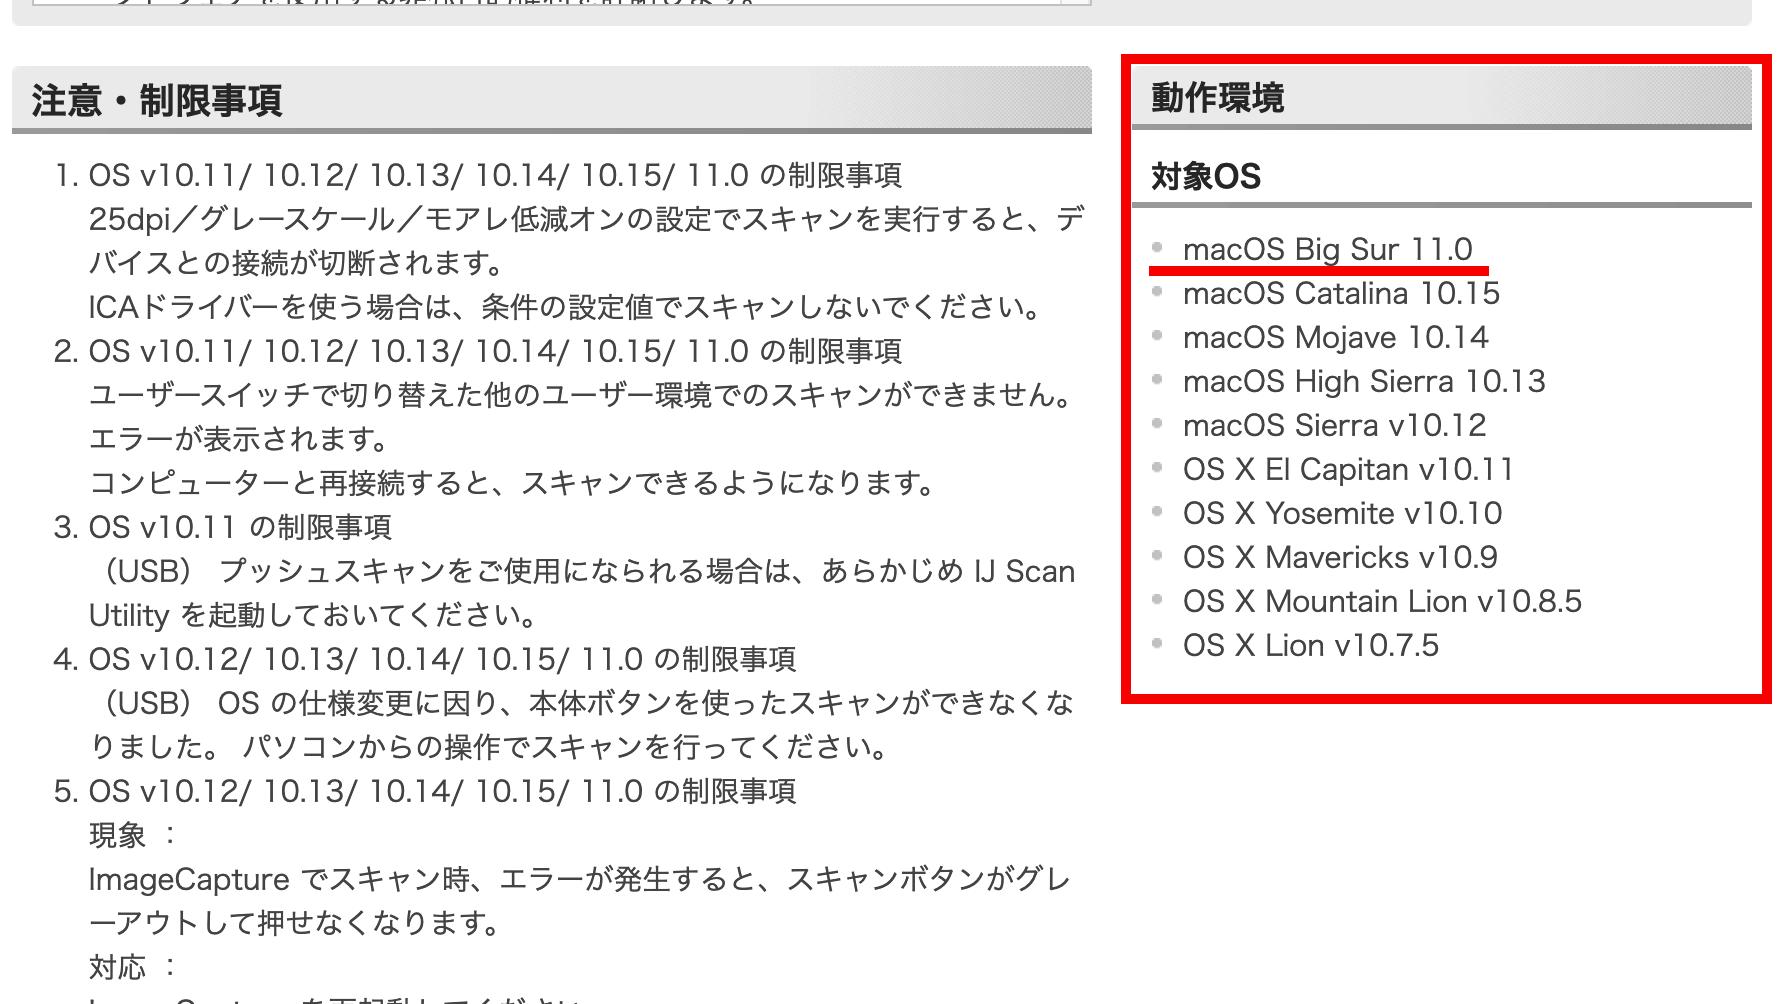 canon MG7500 macbook M1でスキャナー出来ない